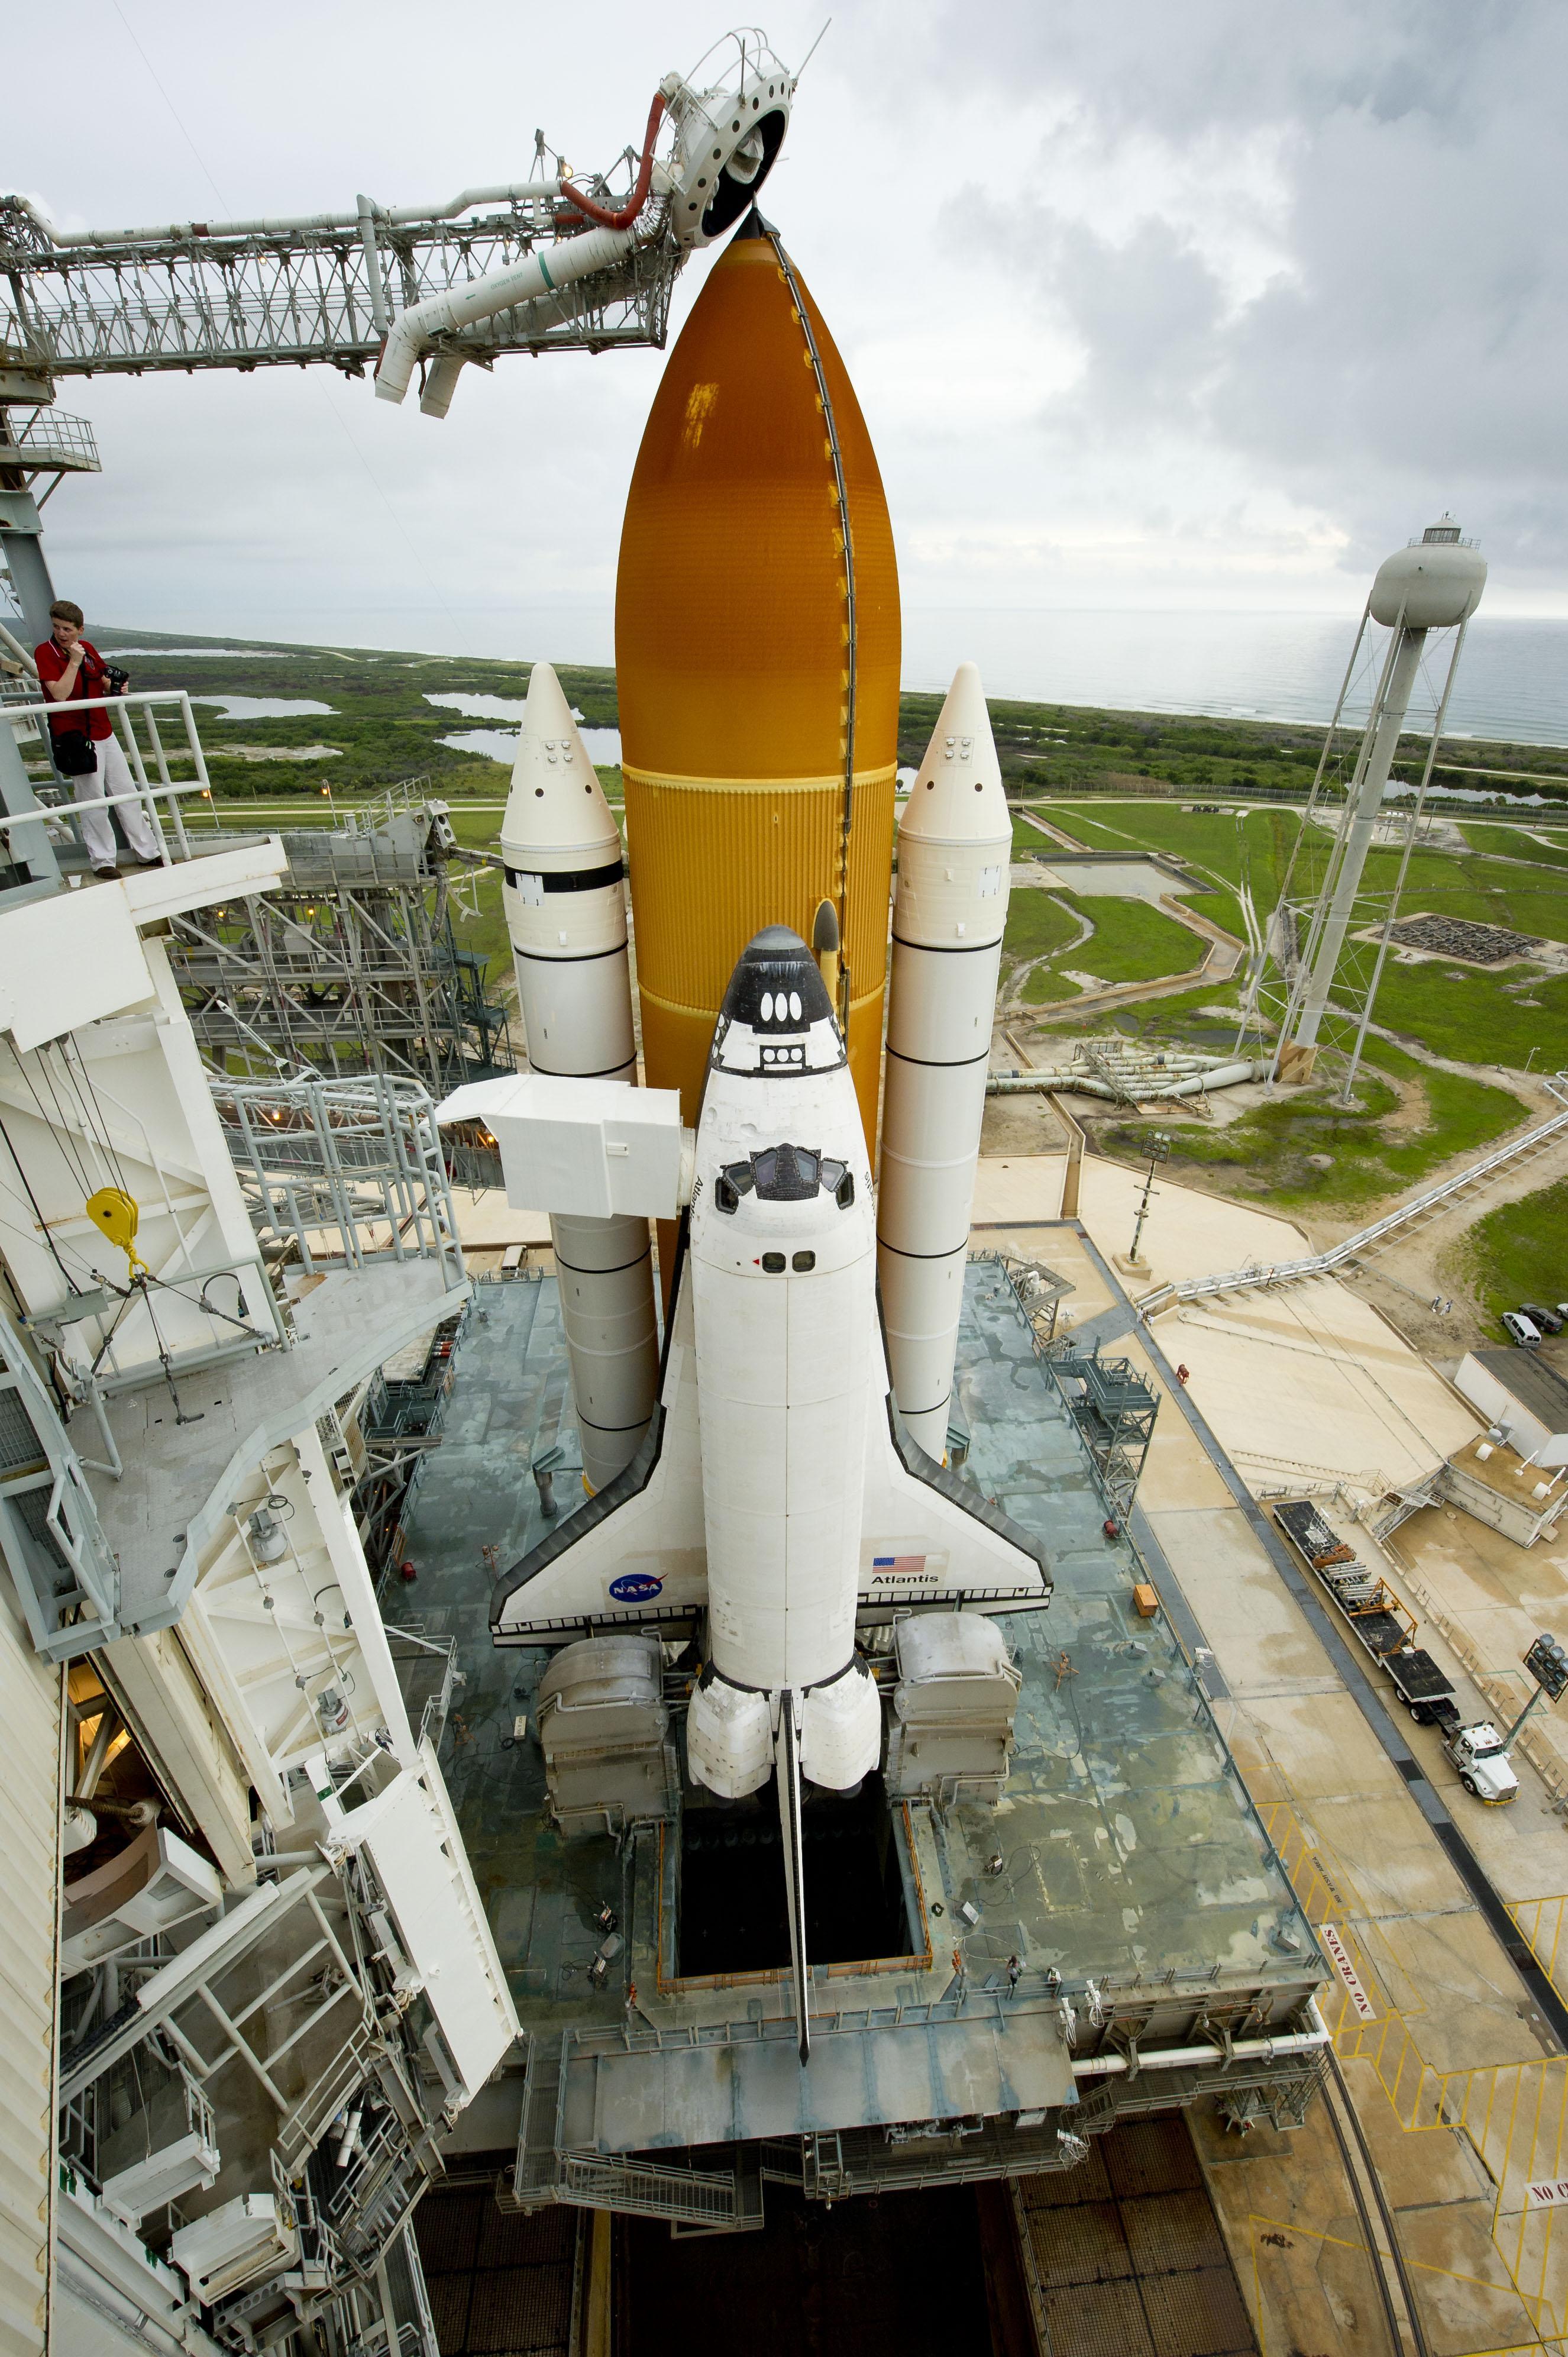 space shuttle atlantis mission - photo #44